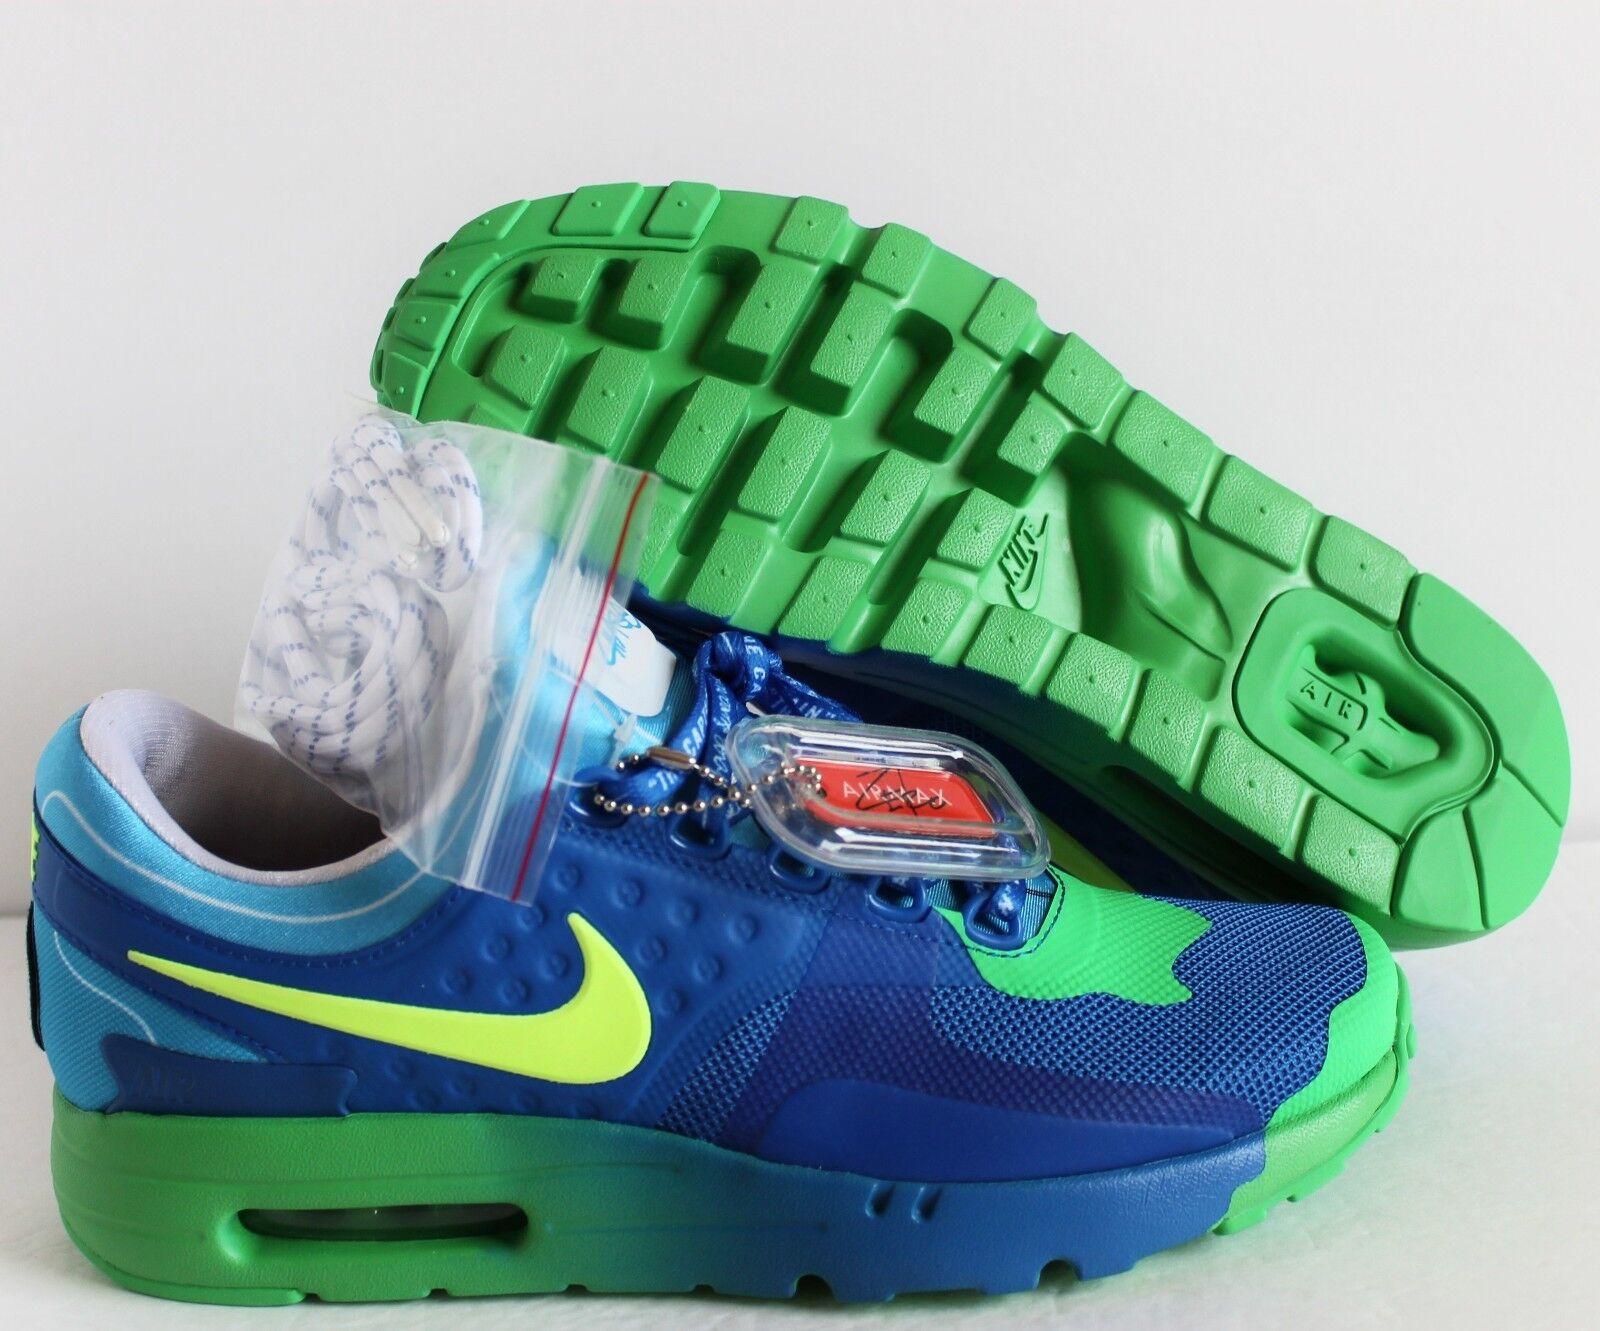 Max Zero DB Doernbecher Nike Air Cobalto/Volt Hyper Cobalto/Volt Air [898636-473] ee6bab